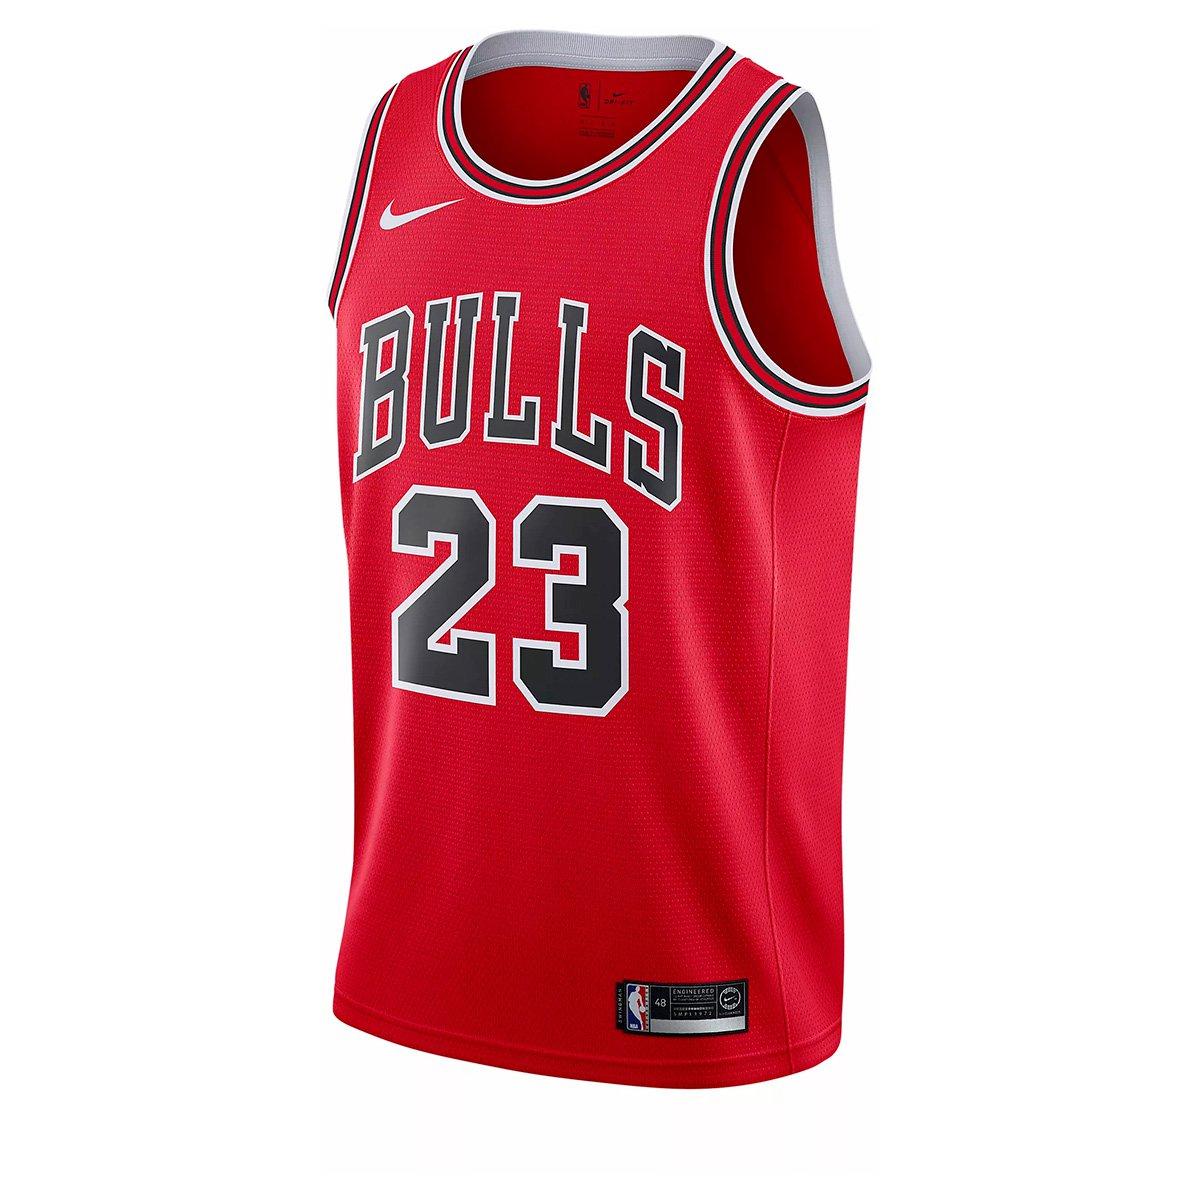 cc36419be3f2b Camisa Regata Nike Chicago Bulls Swingman Road NBA - Michael Jordan -  Compre Agora